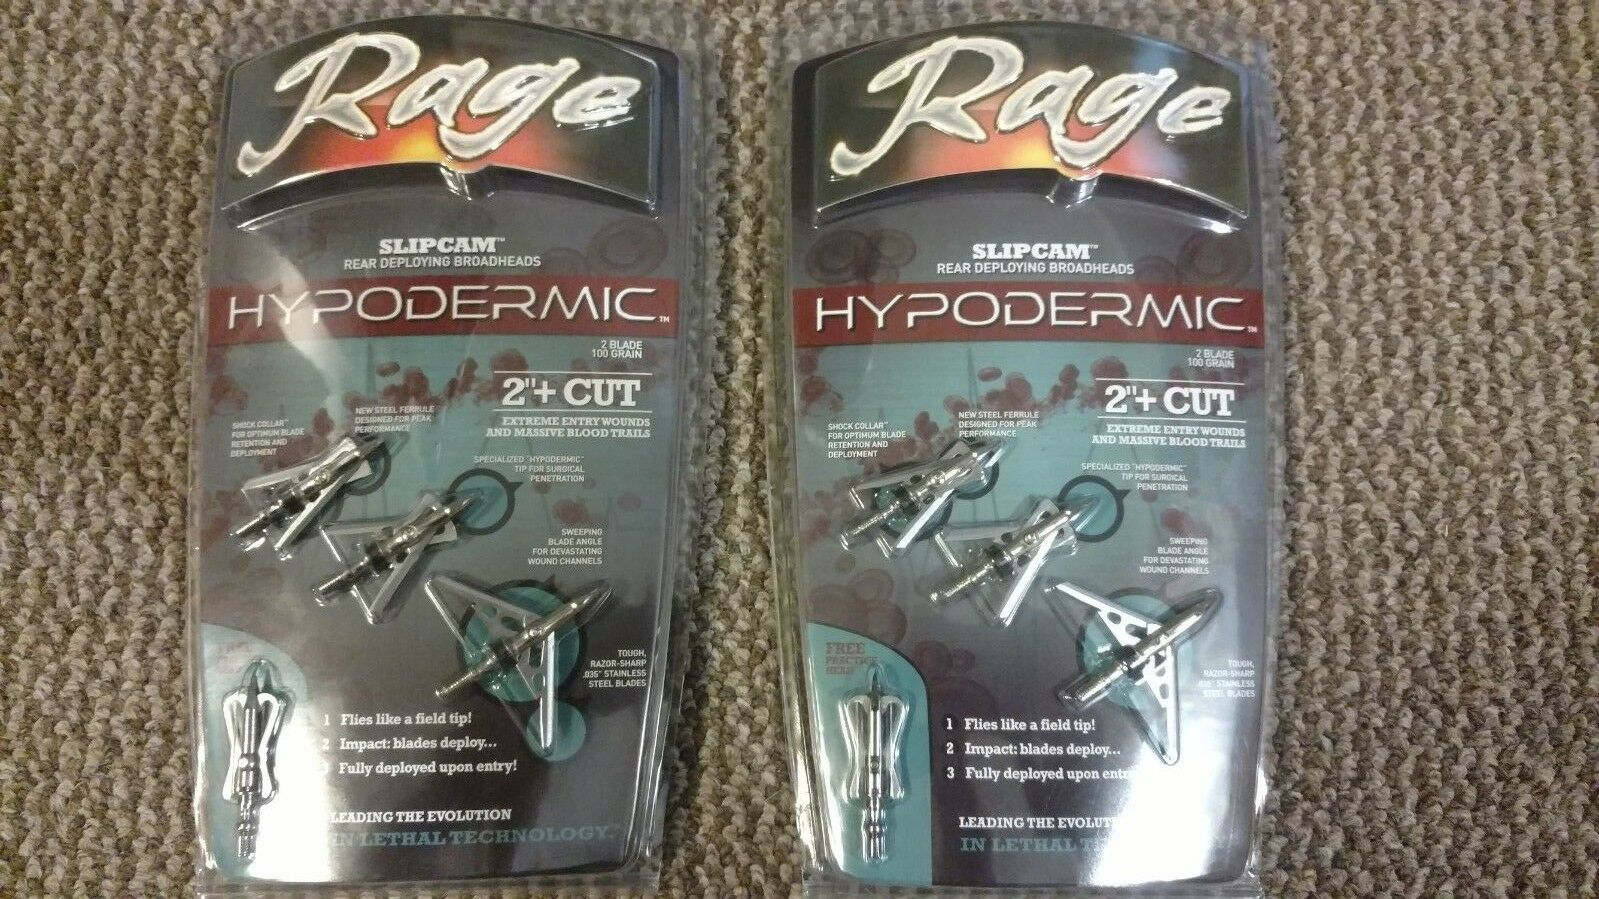 (2) NEW Rage Hypodermic Broadheads Slipcam Mechanical 100 Grain 2  Cut  3pk